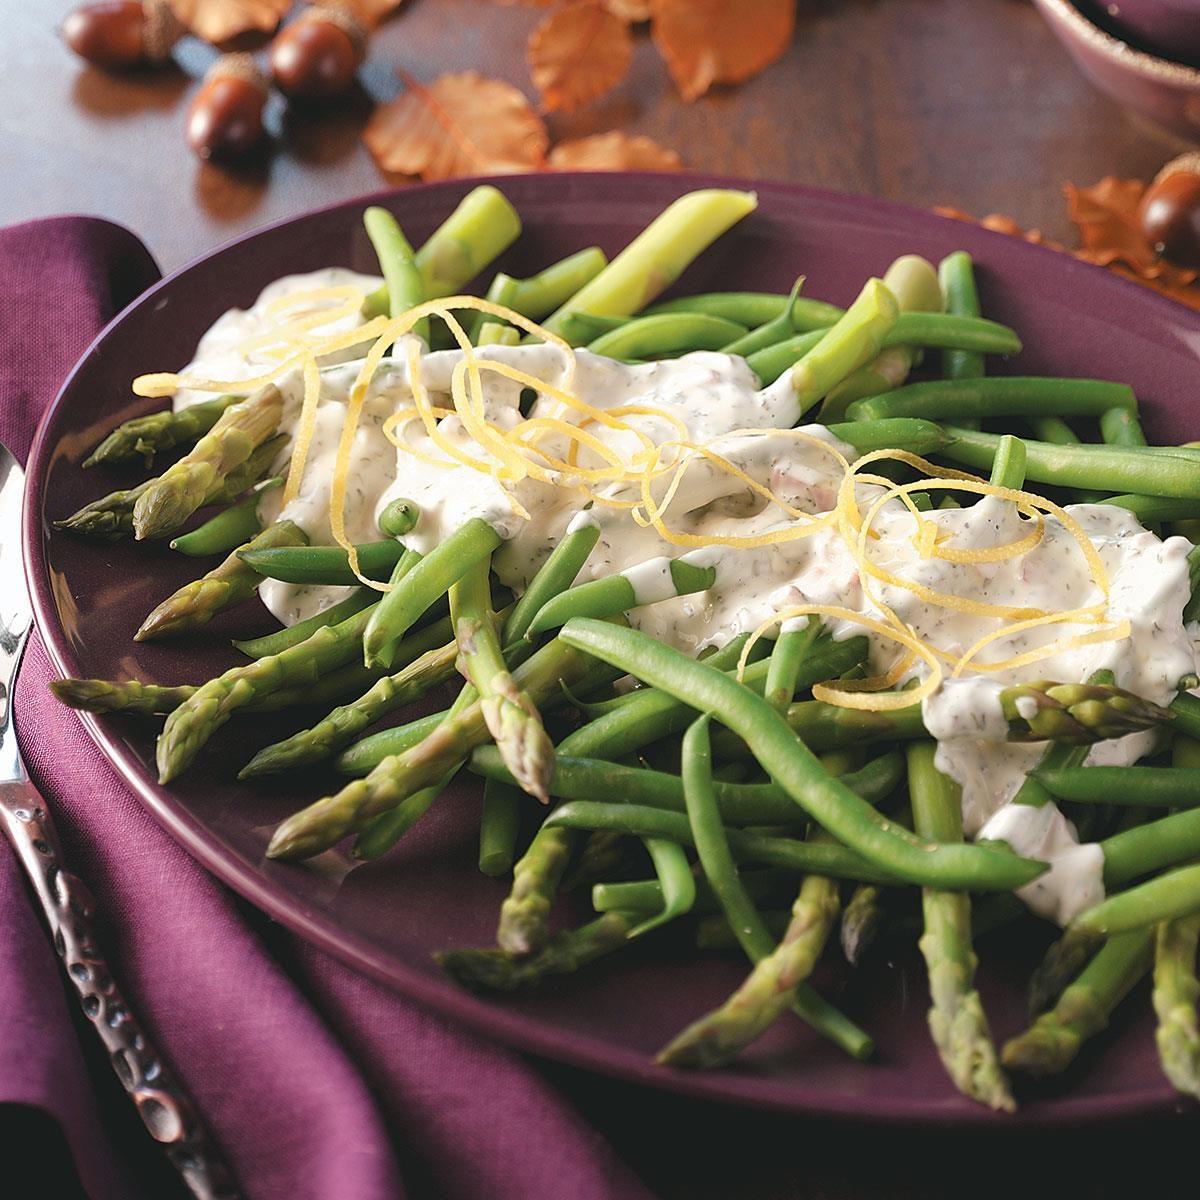 Asparagus And Green Beans With Tarragon Lemon Dip Recipe